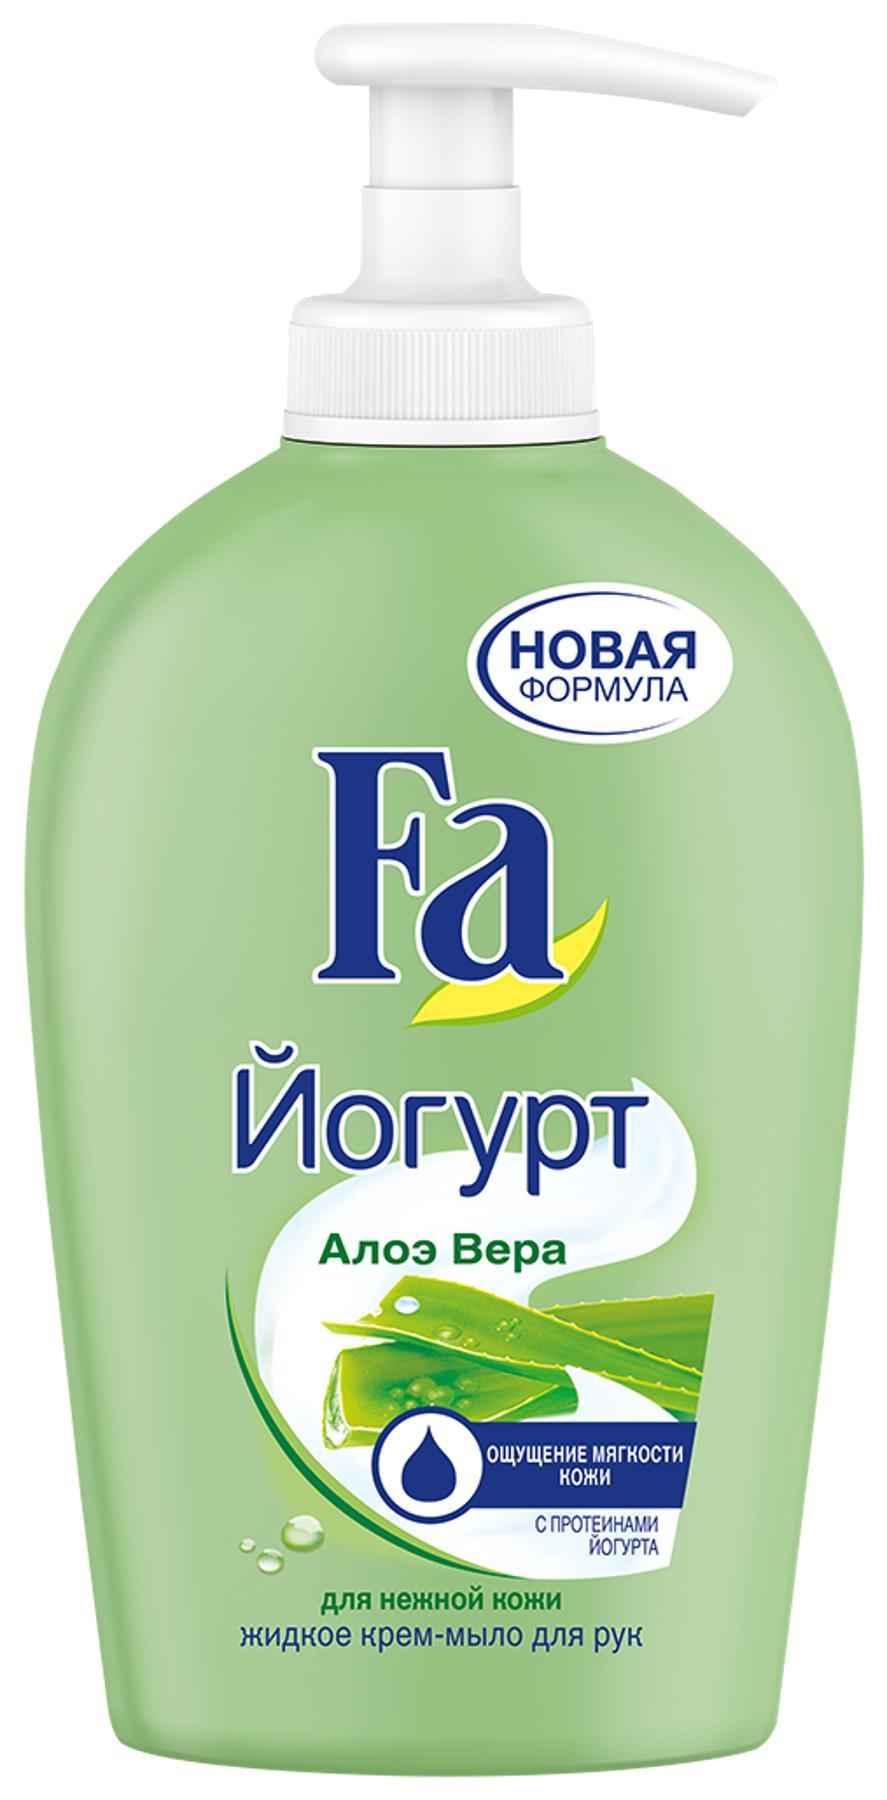 Fa Жидкое Мыло Yoghurt Алоэ Вера, 250 мл fa жидкое крем мыло youghurt алоэ вера 250 мл жидкое крем мыло youghurt алоэ вера 250 мл 250 мл